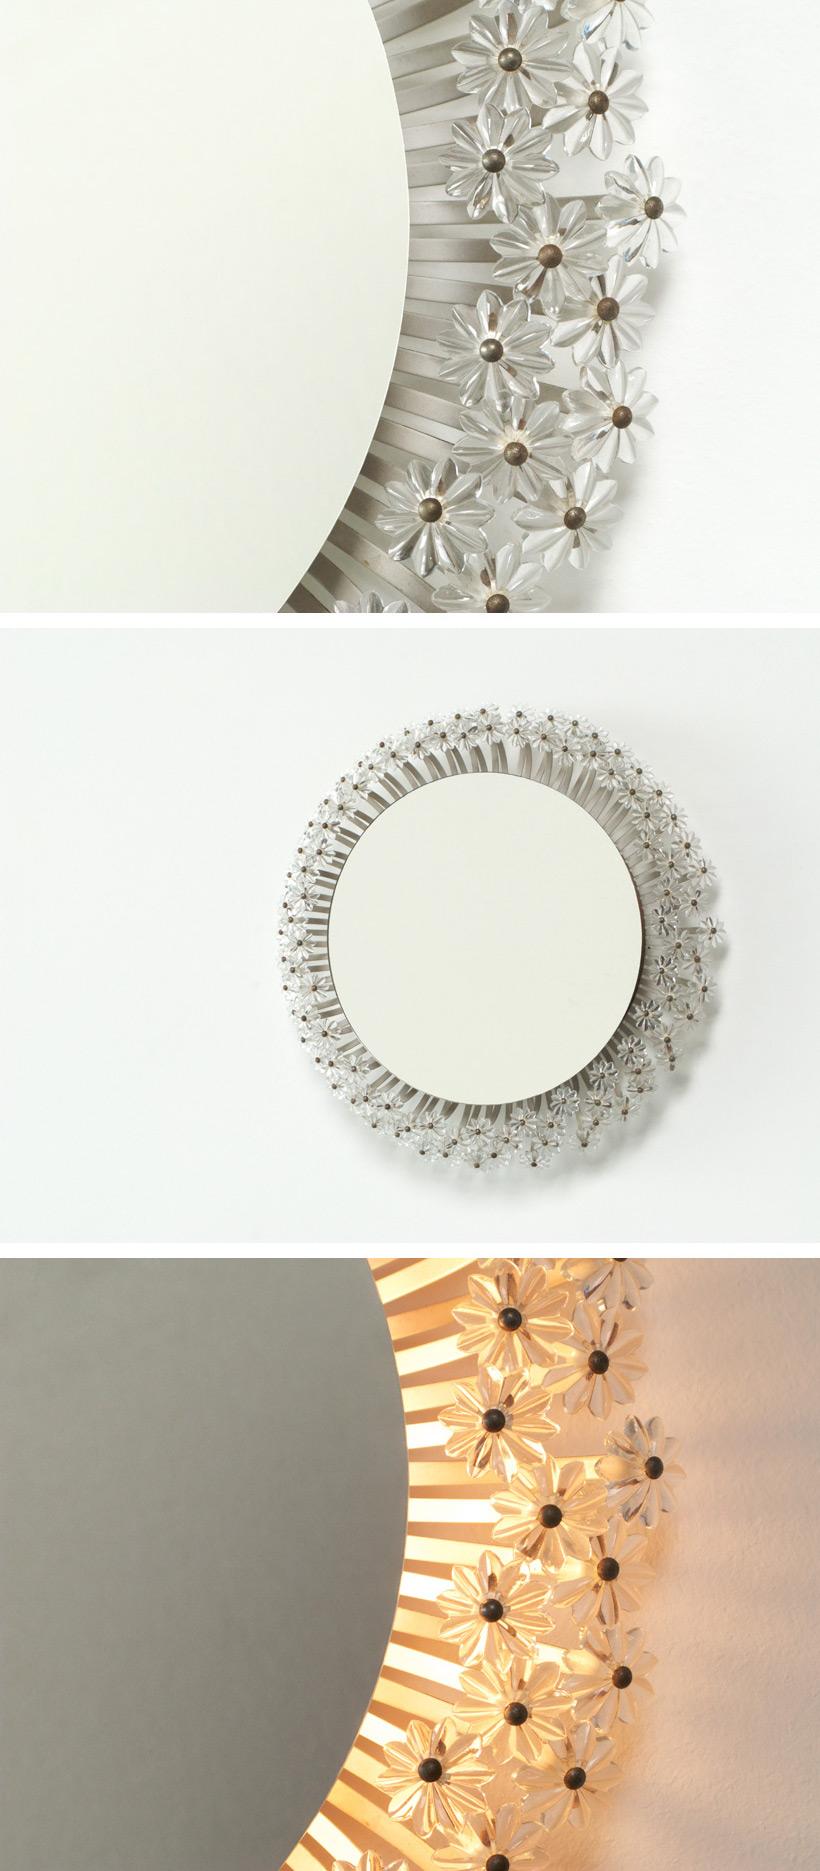 Circular illuminated flower mirror Large